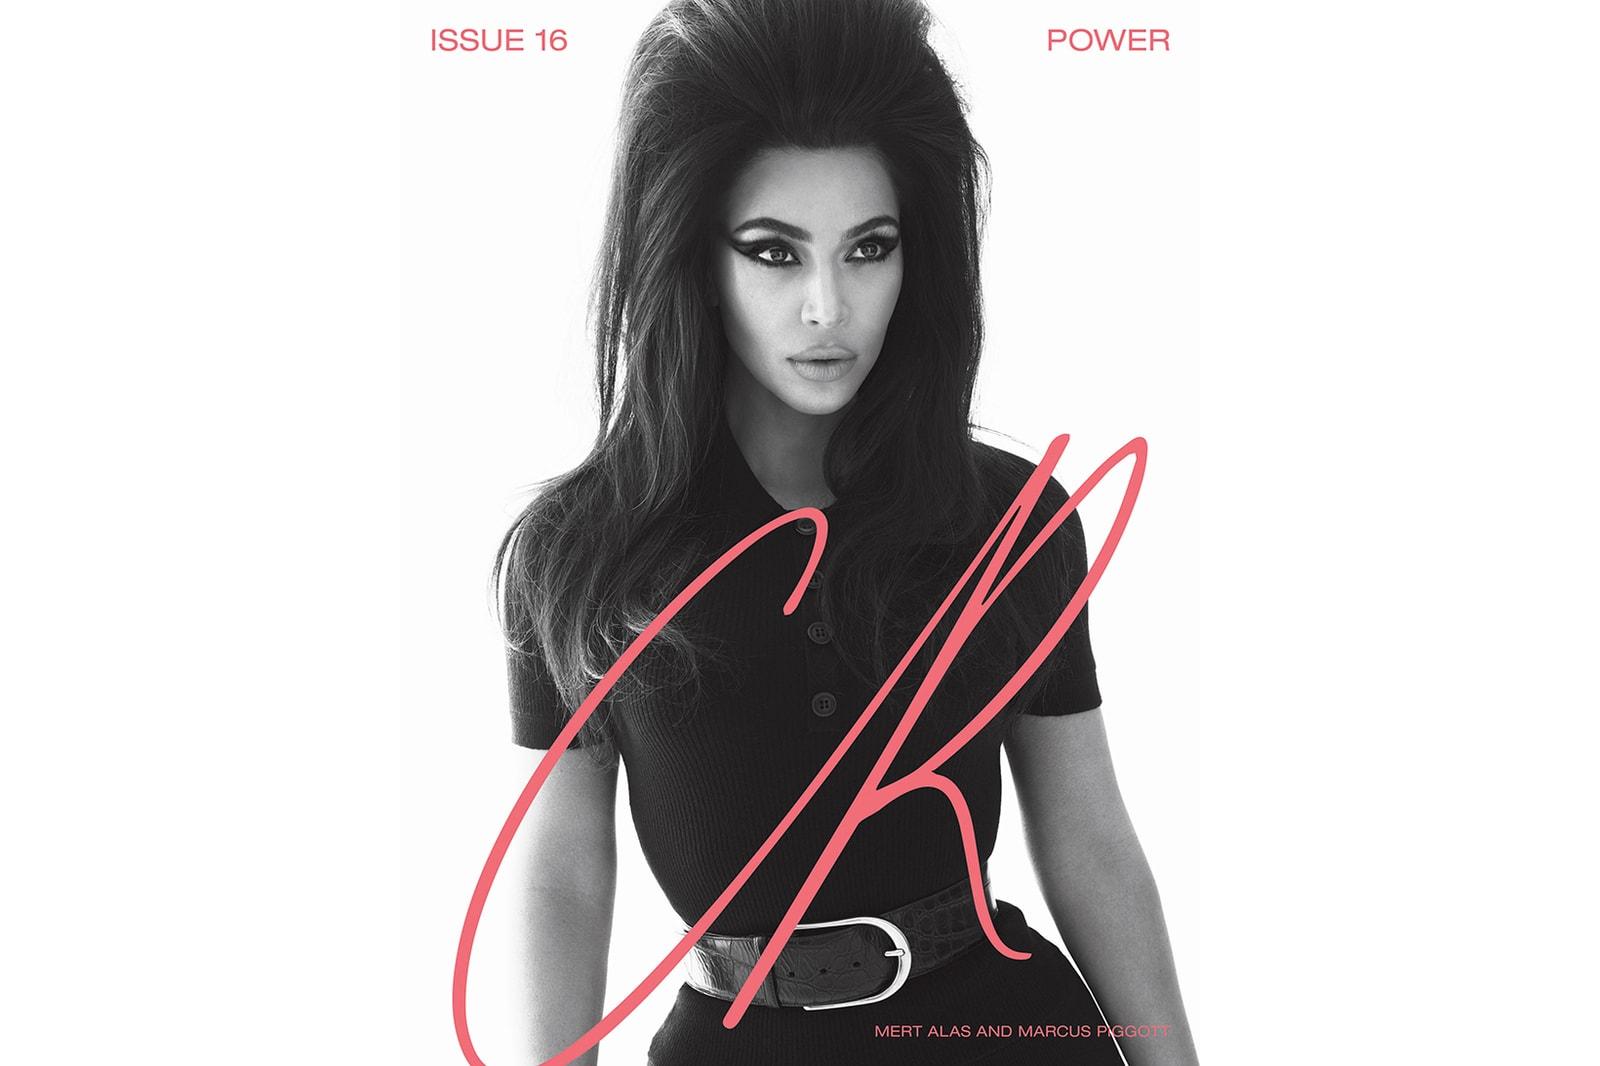 Kim Kardashian Cher CR Fashion Book Power Issue 16